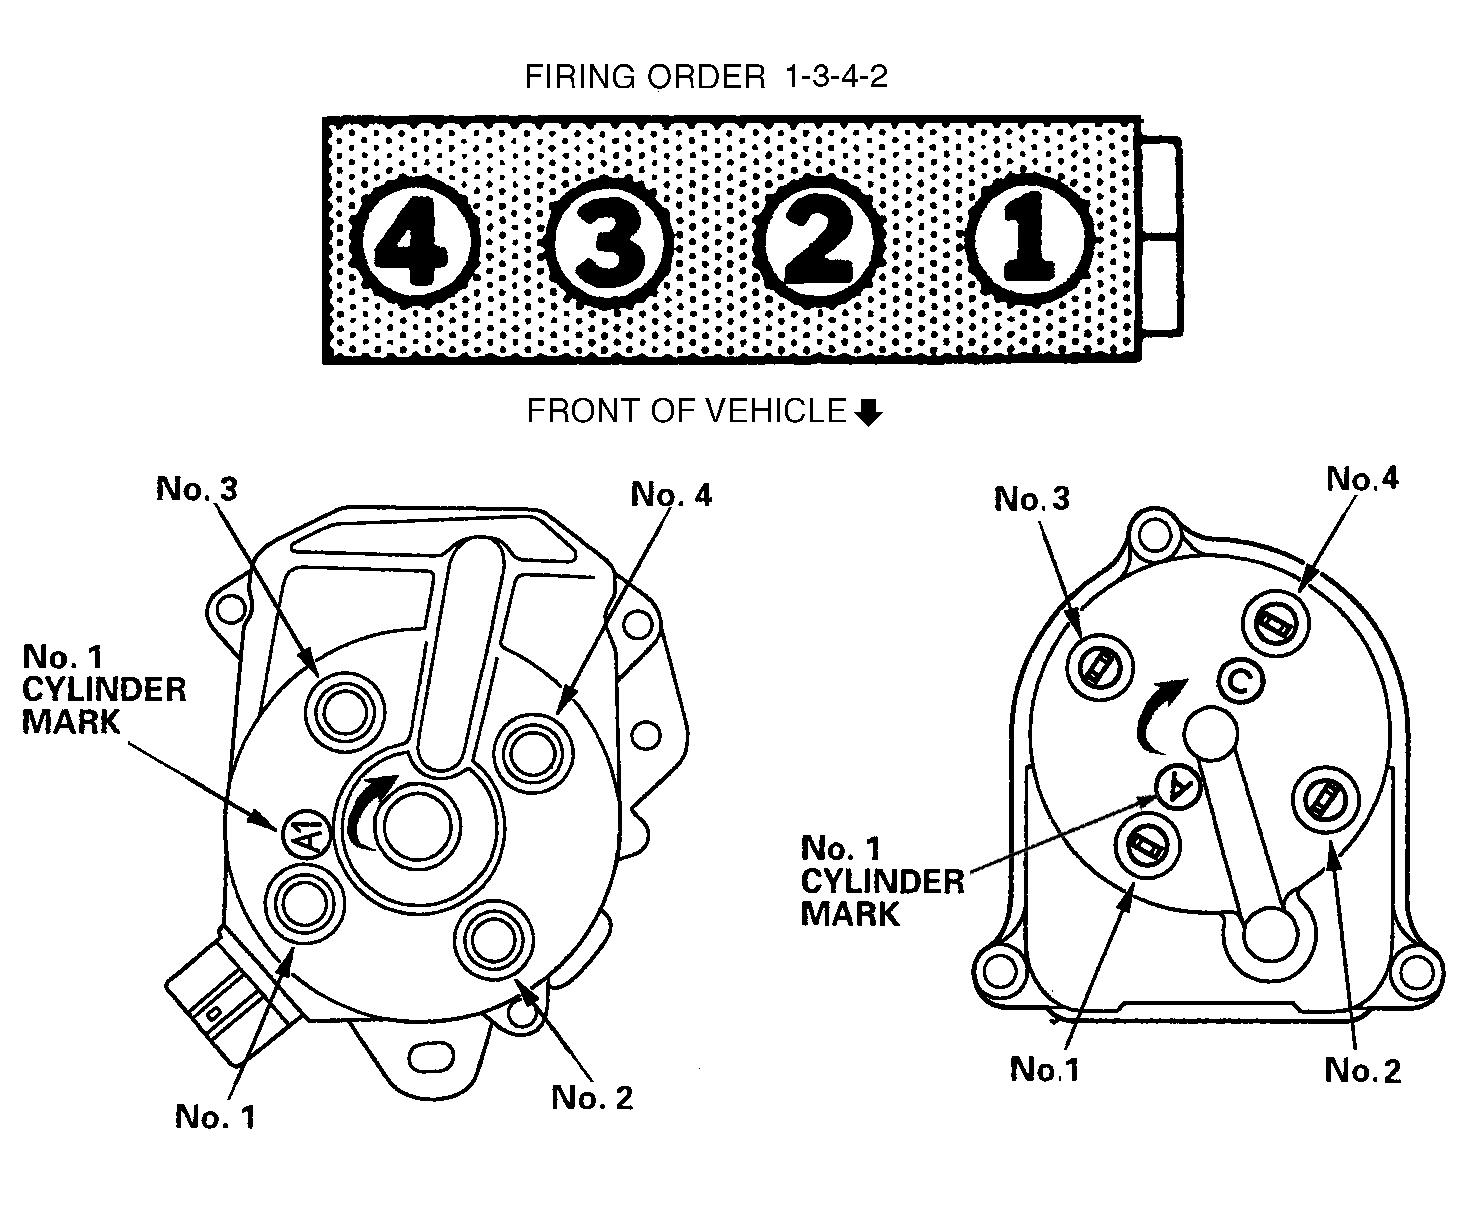 2007 Honda Accord Firing Order Diagram - Center Wiring